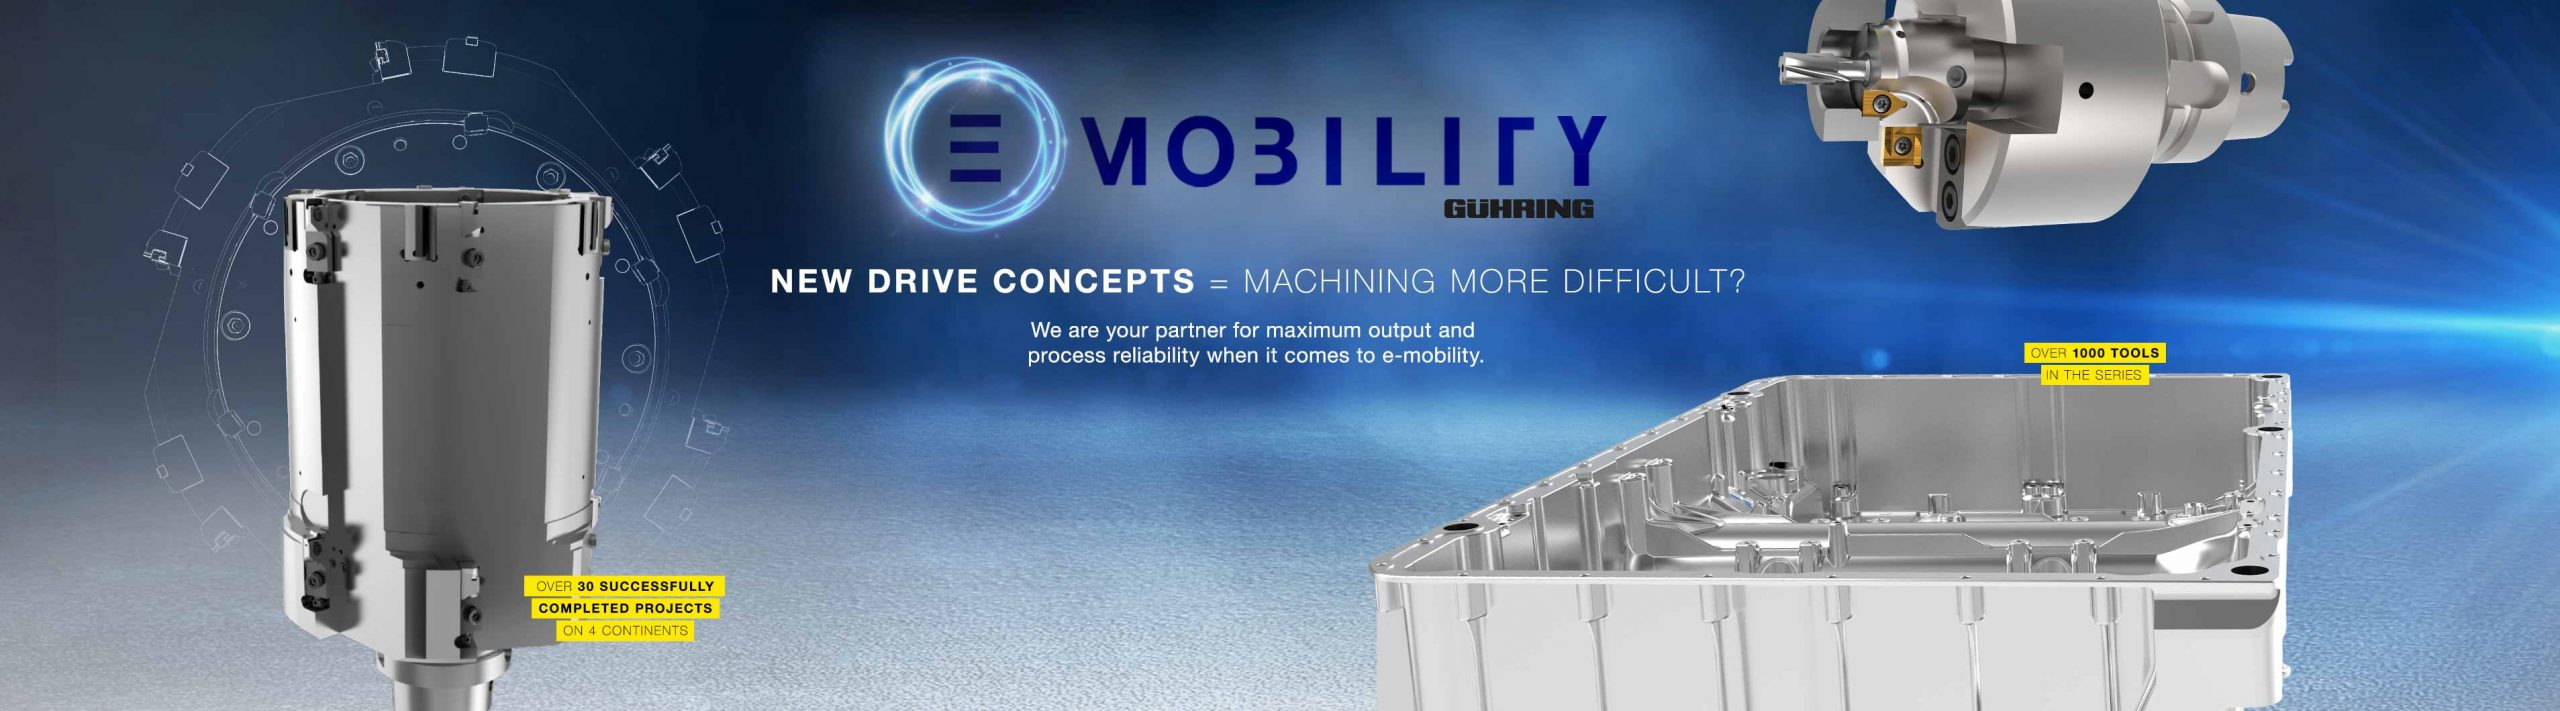 Gühring e-mobility